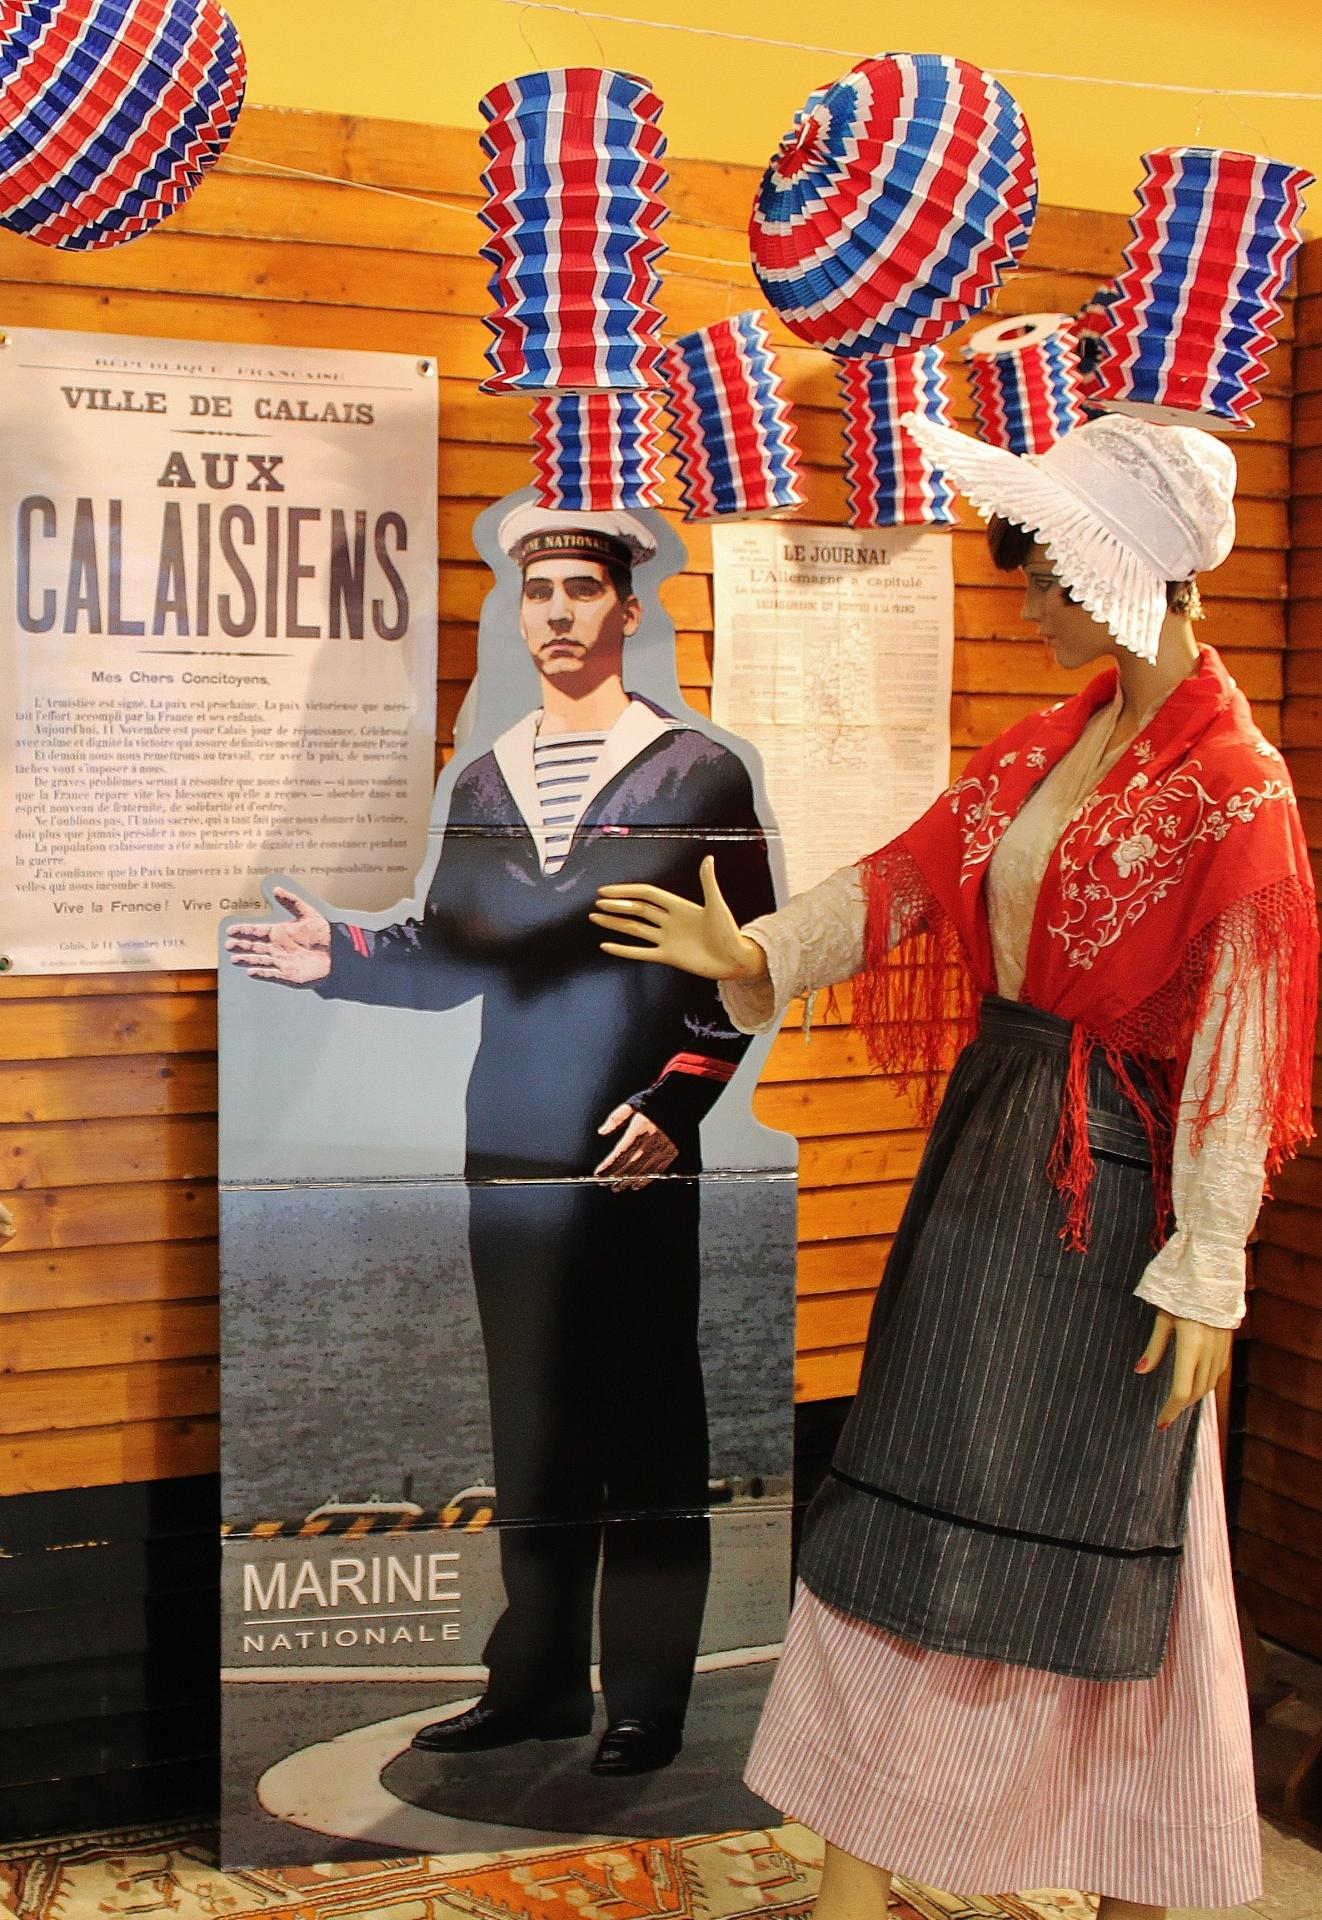 Calais pendant la grande guerre exposition 14 18